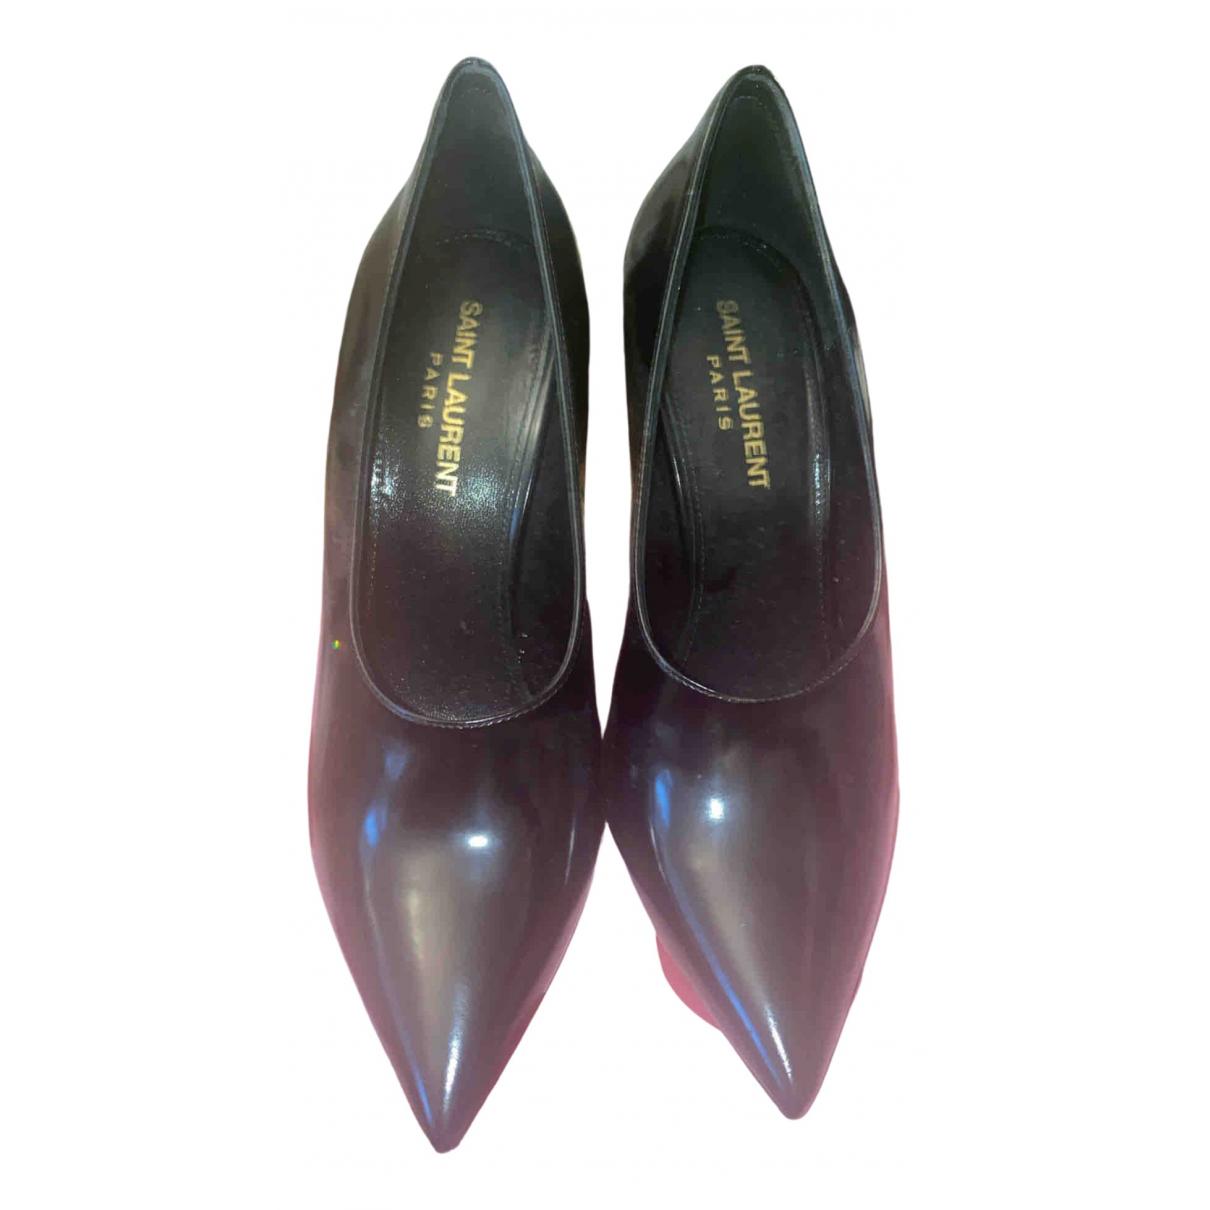 Saint Laurent \N Black Patent leather Heels for Women 37 EU